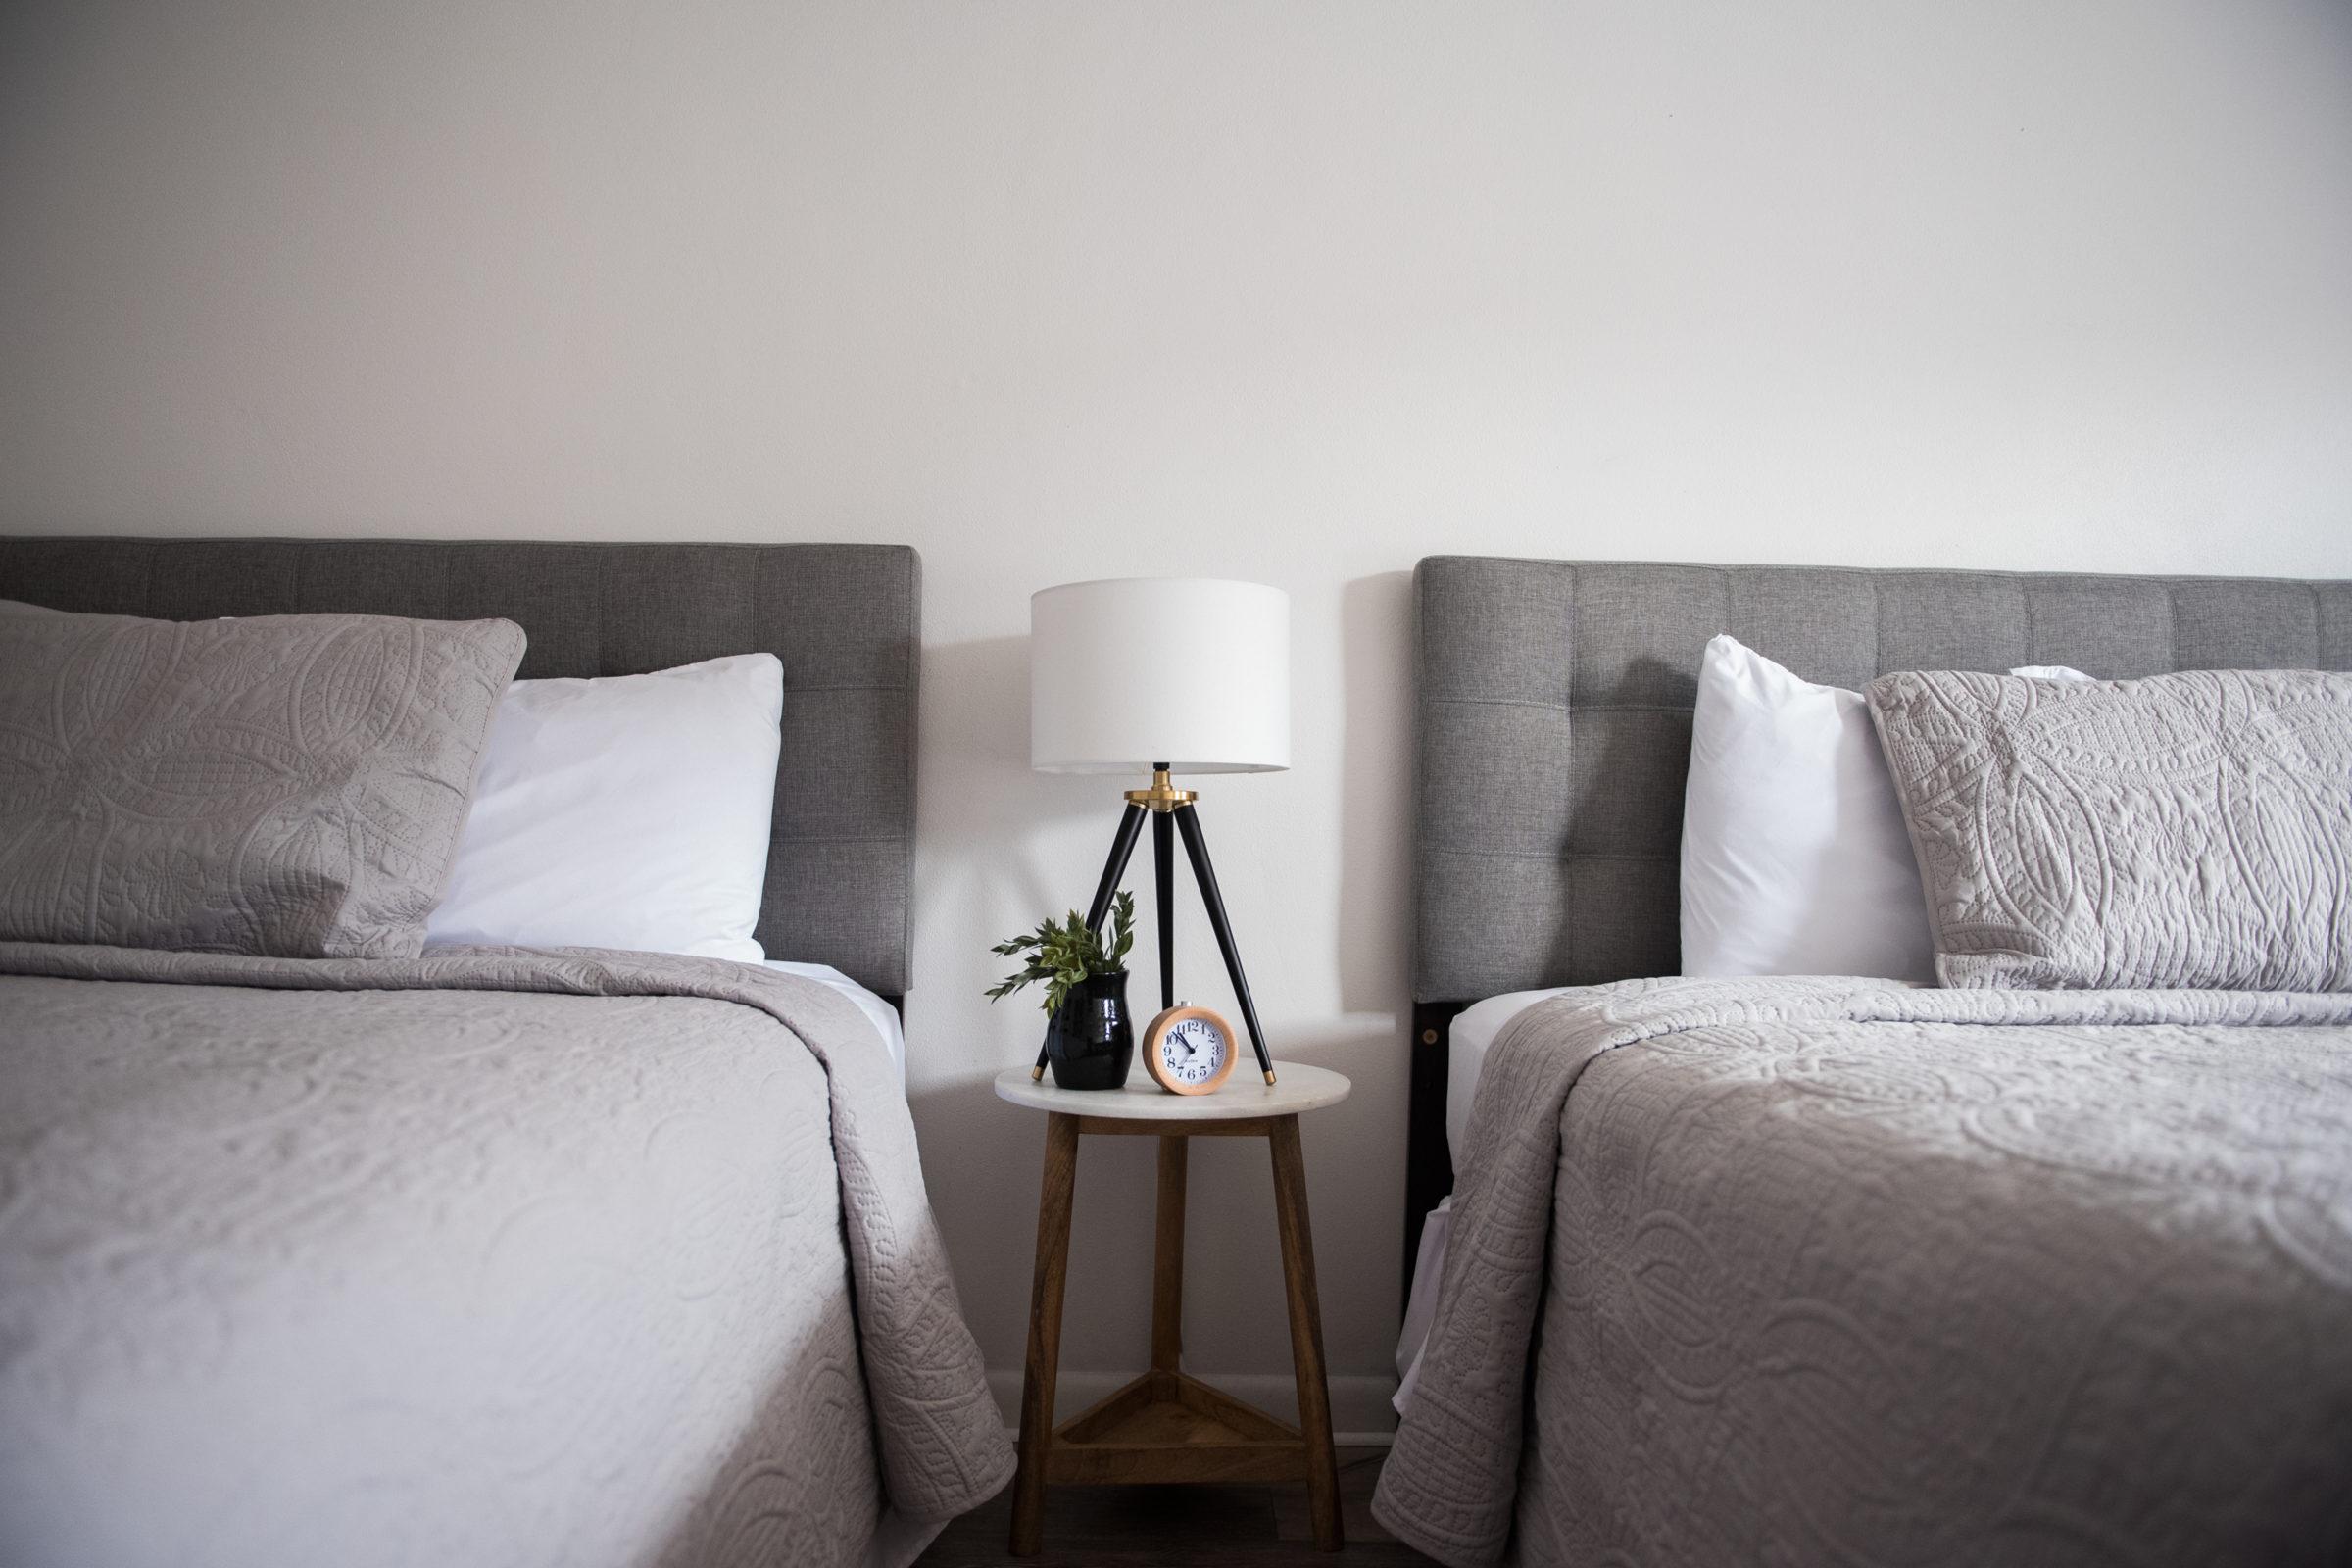 Room 174(3).jpeg(high res) (website)